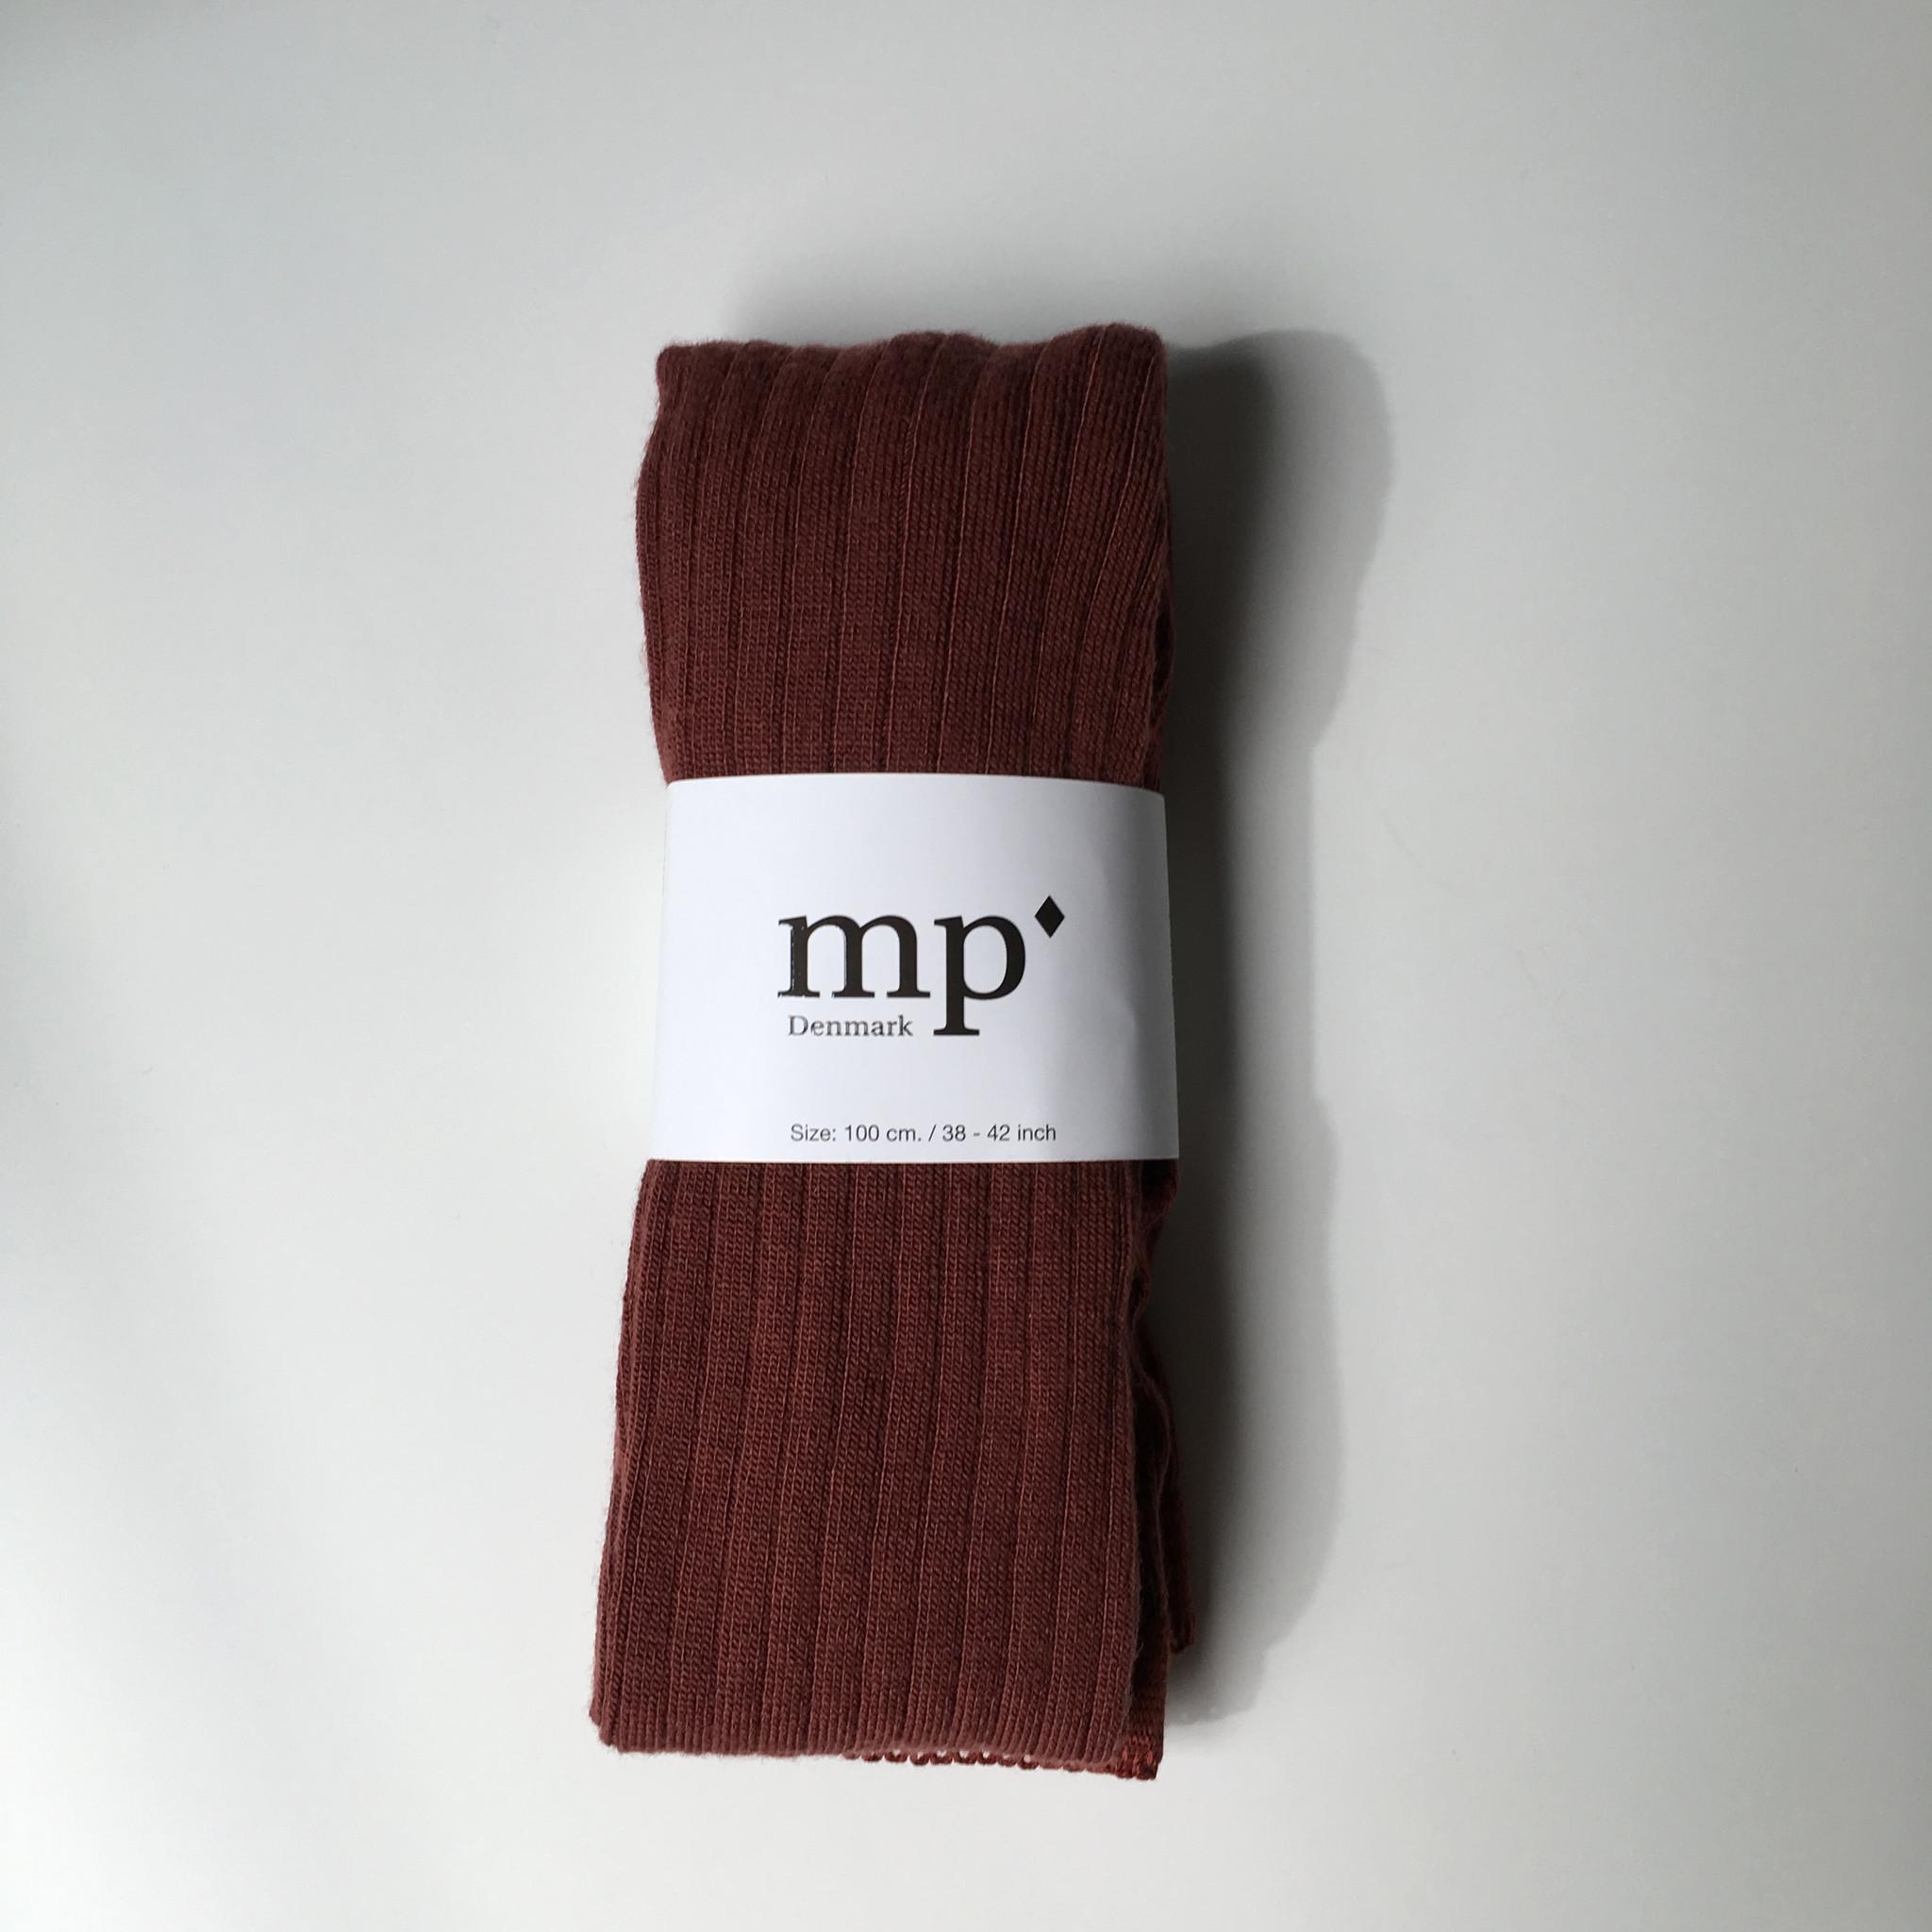 MP Denmark wollen maillot - geribd - roodbruin - 90 tm 160